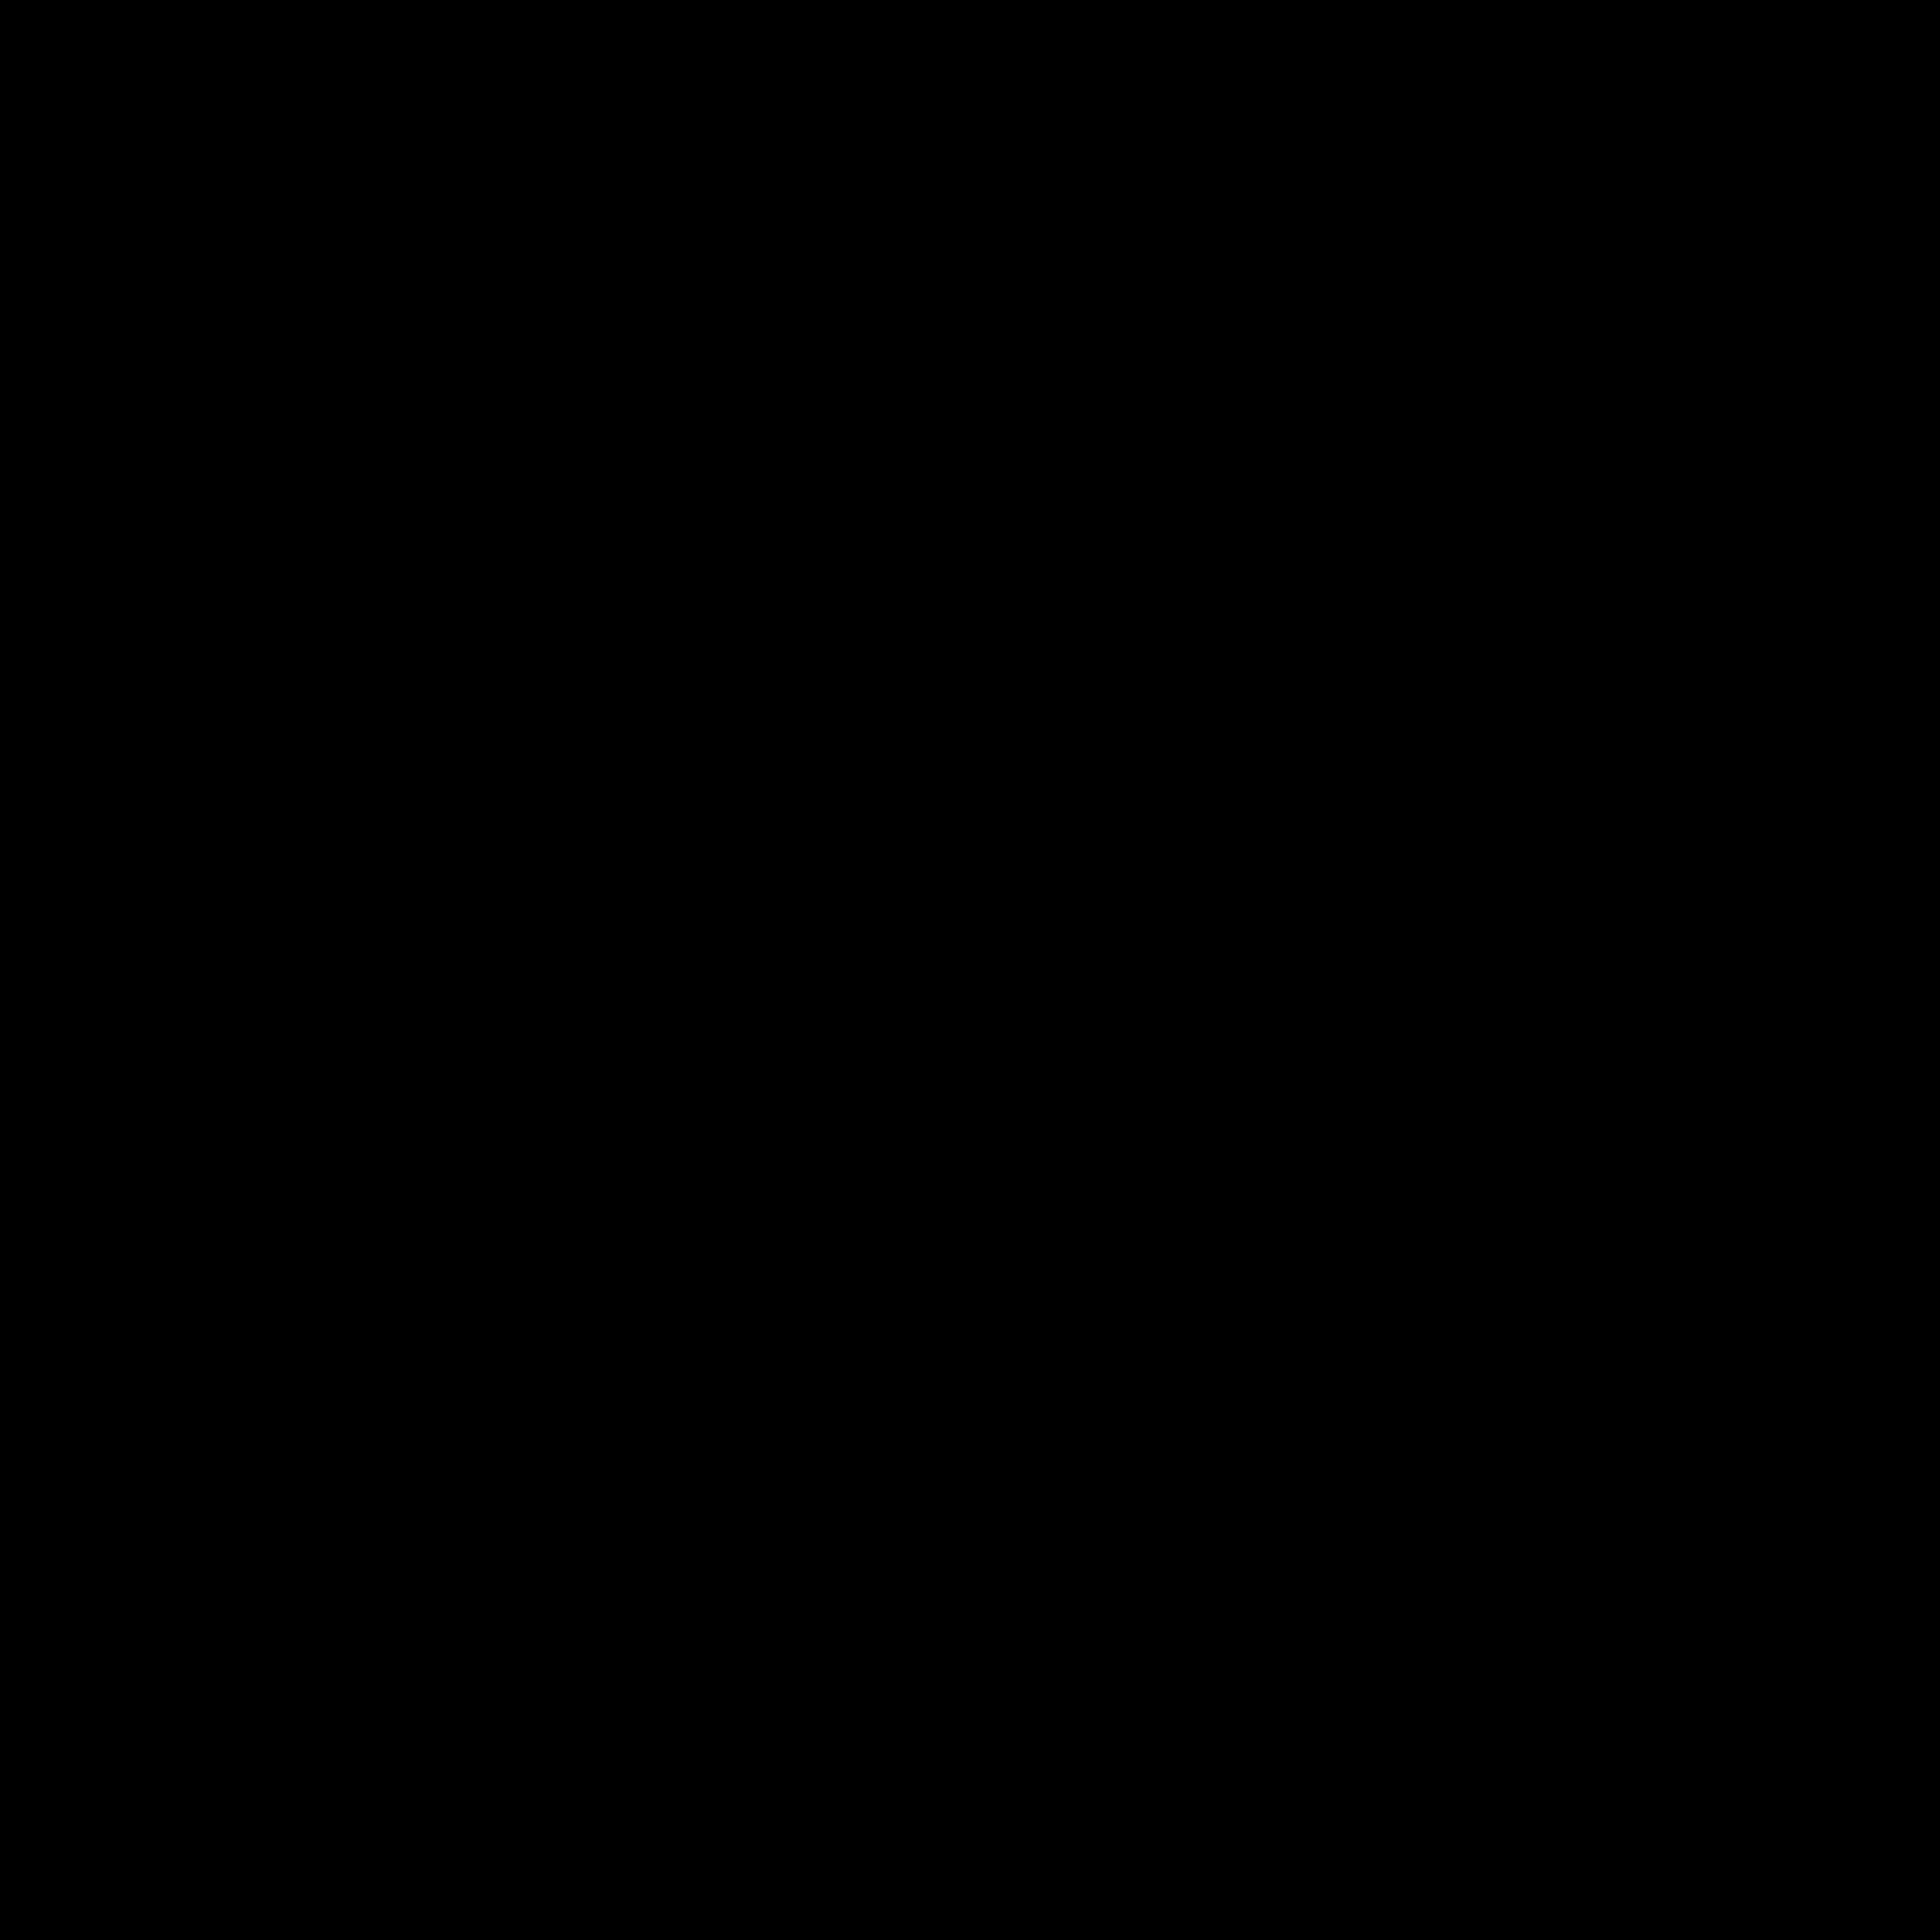 Clipart world globle. Globe icon big image